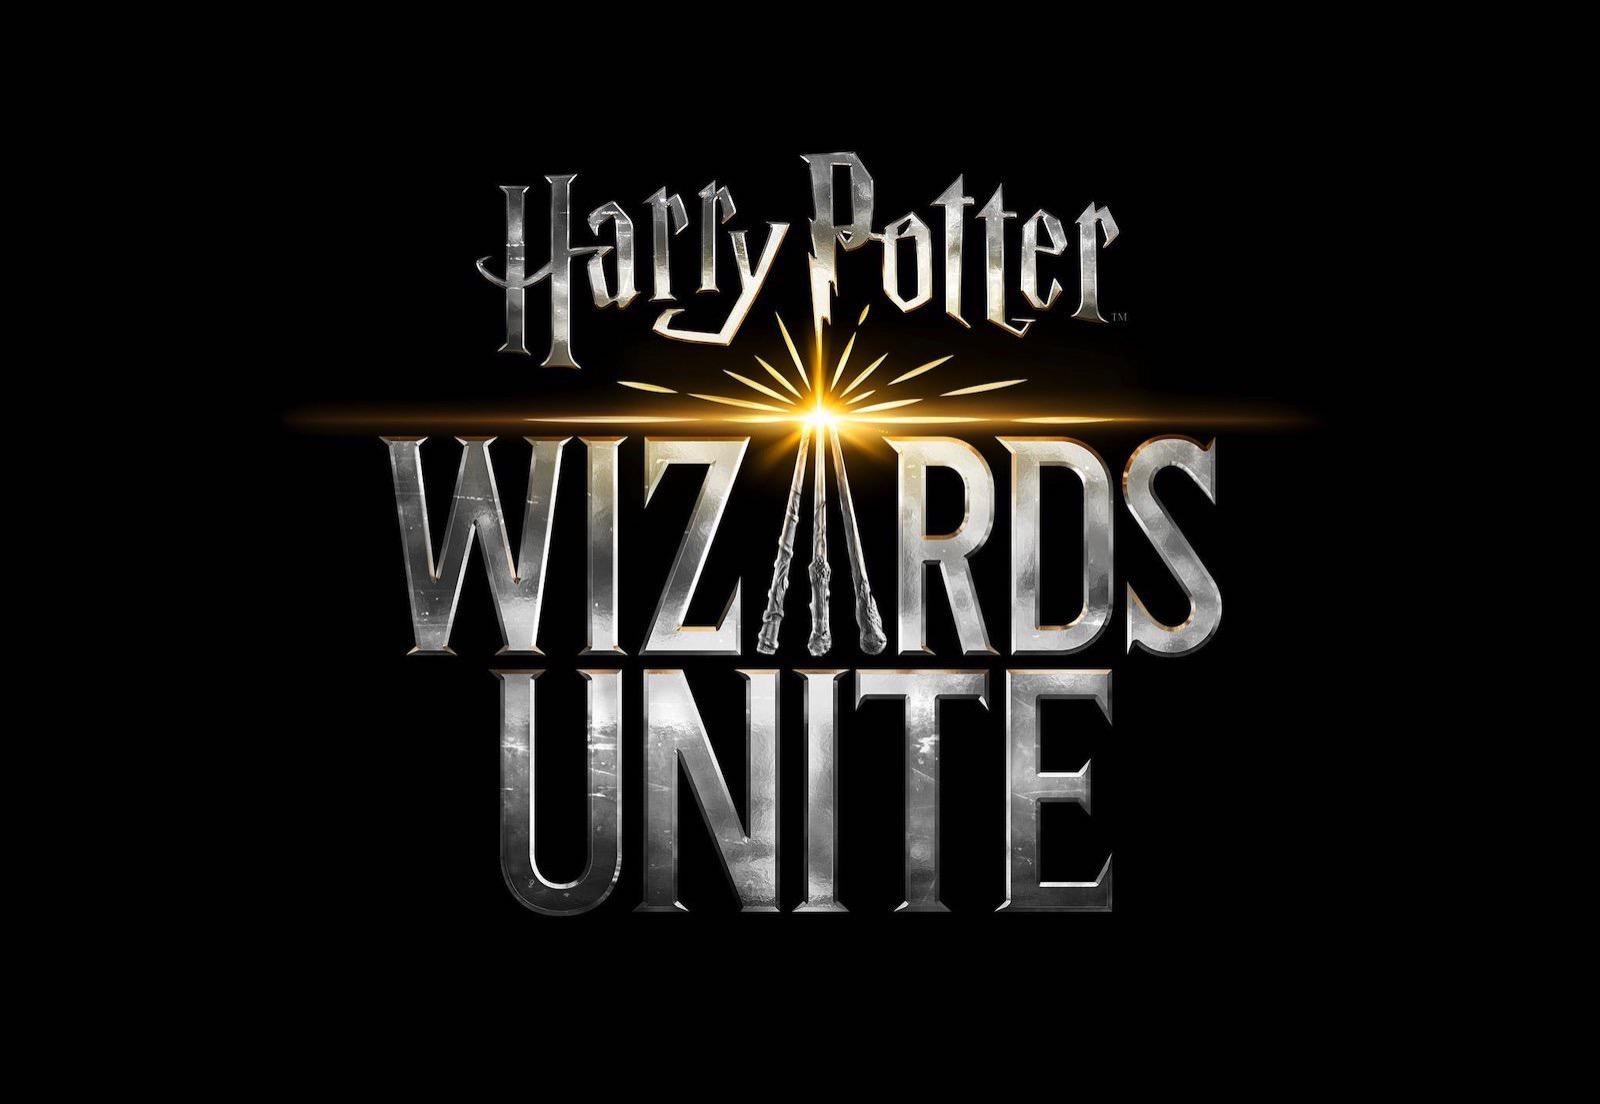 Happy Potter Wizards Unite